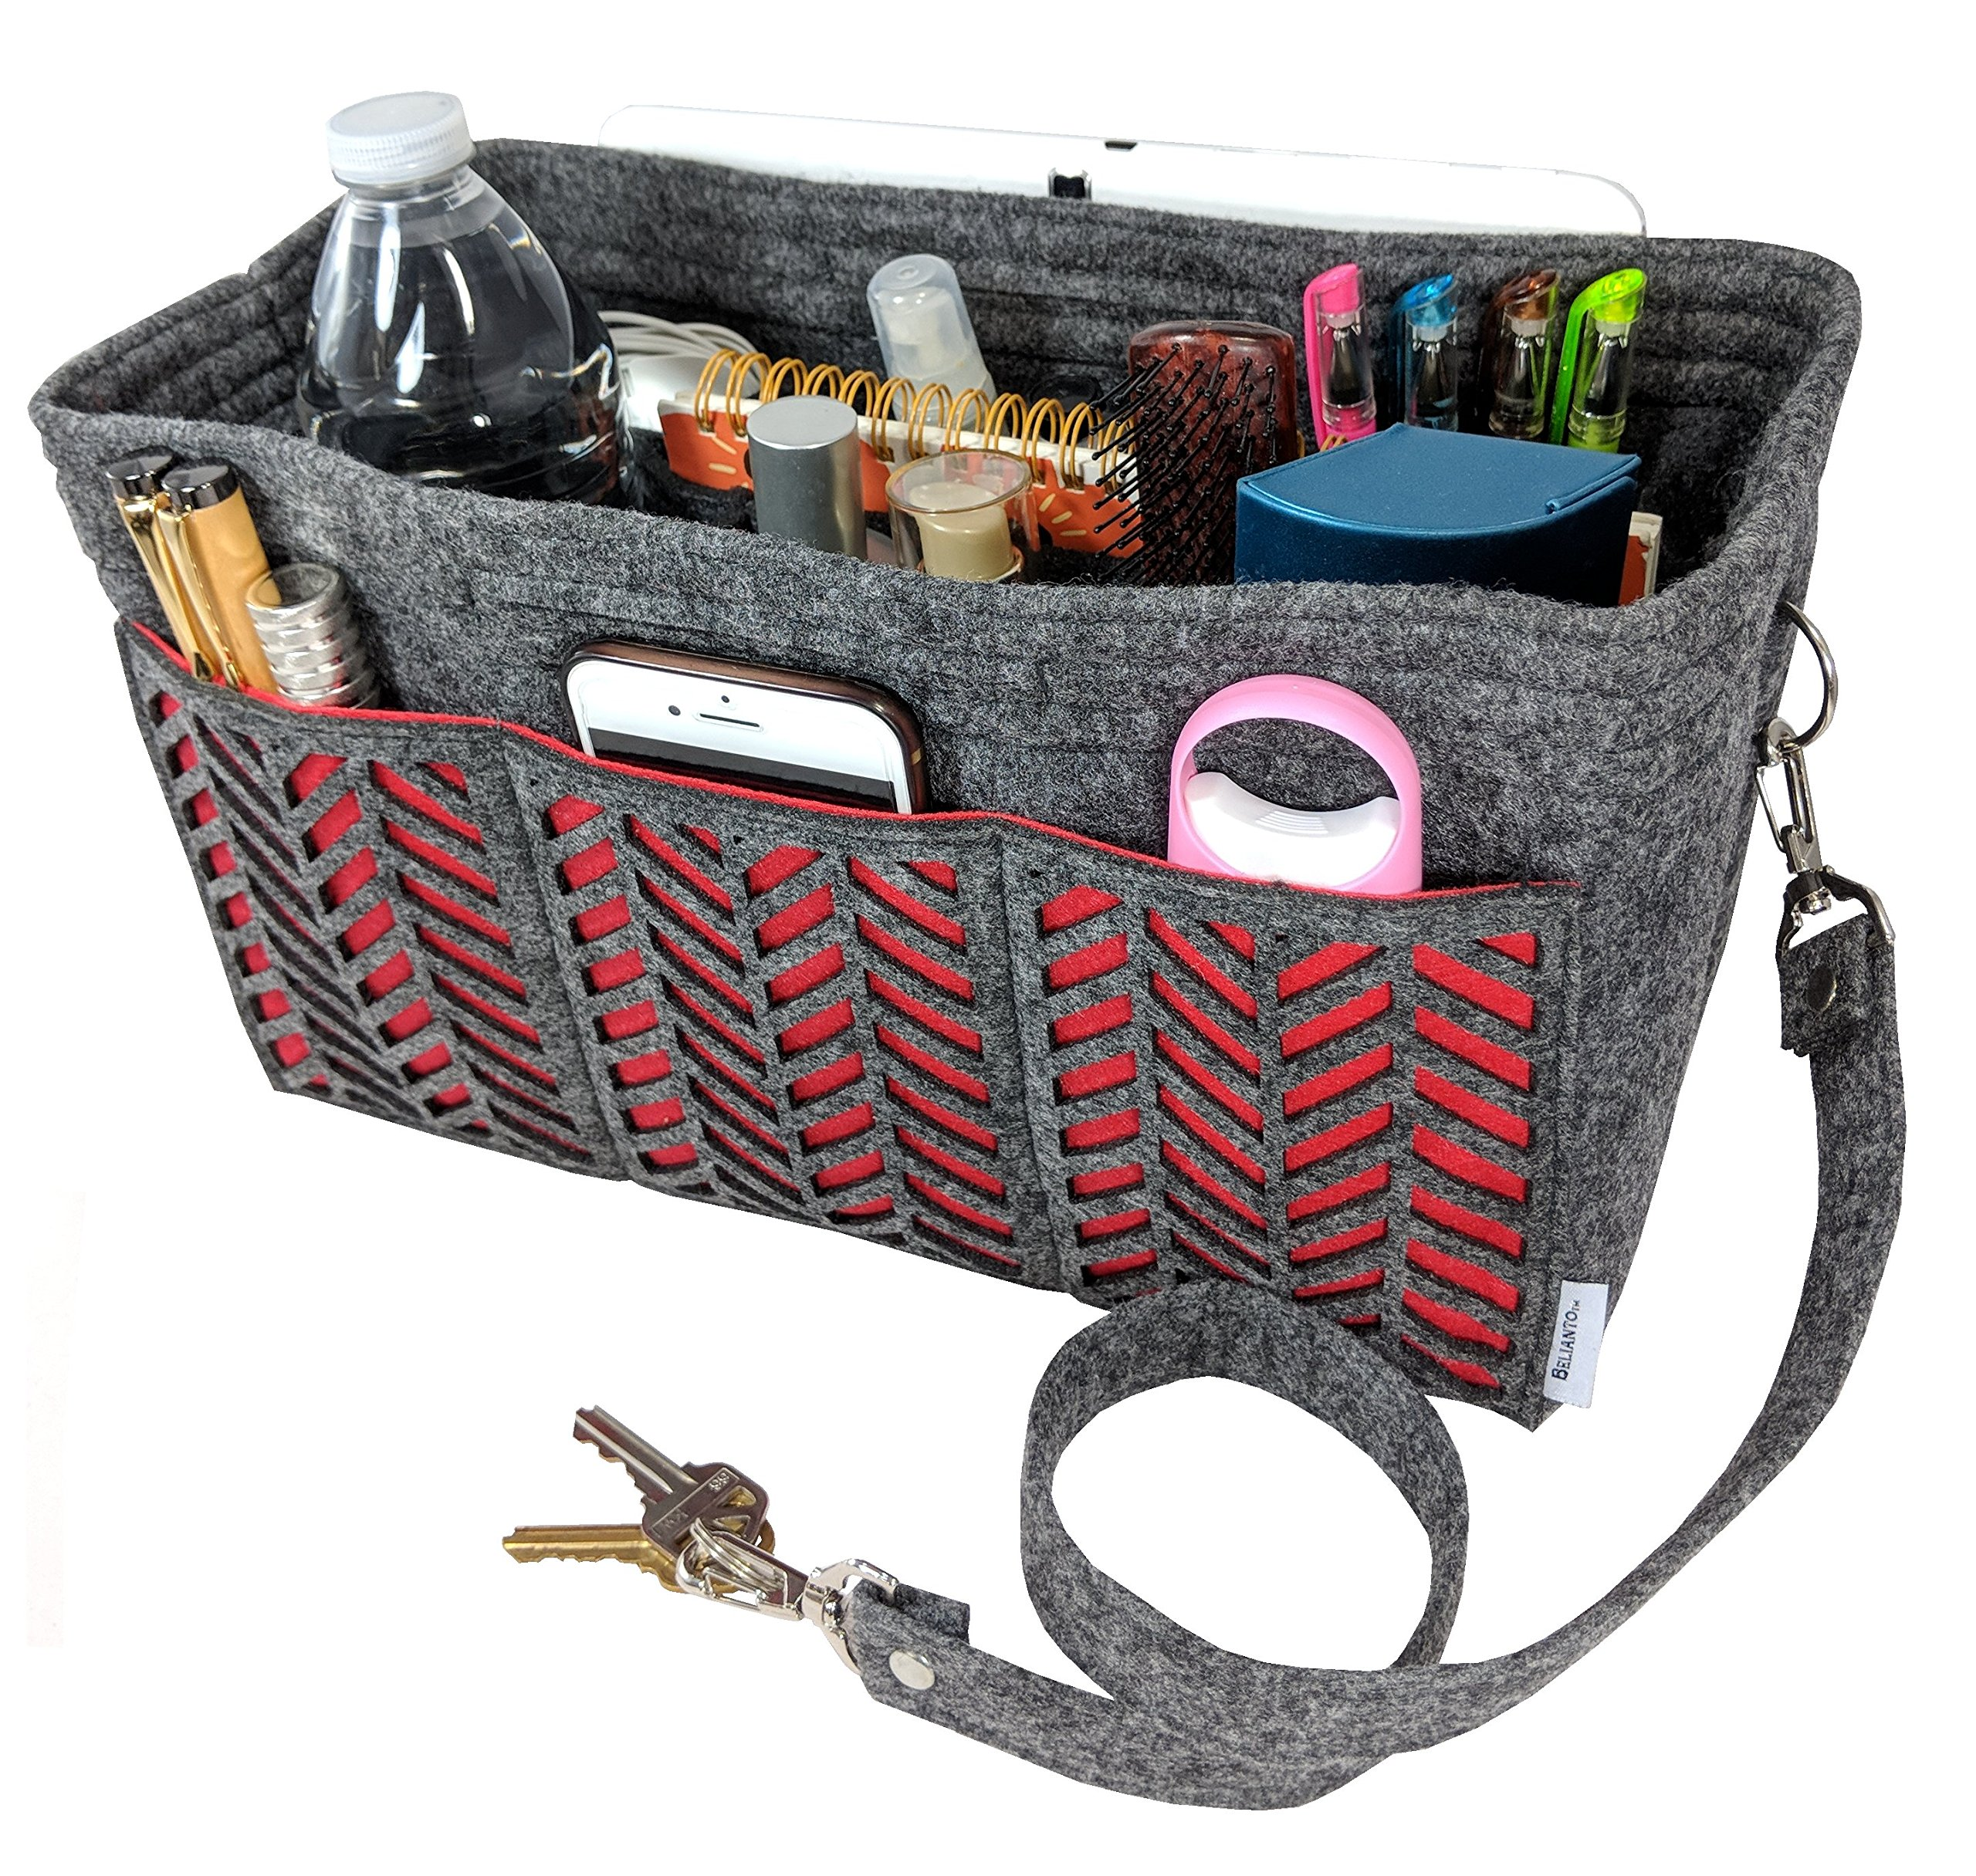 BELIANTO Felt Purse Organizer - Middle Insert, Bottle Holder for Tote Handbag Purse (Herringbone) (Large, Dark Grey)